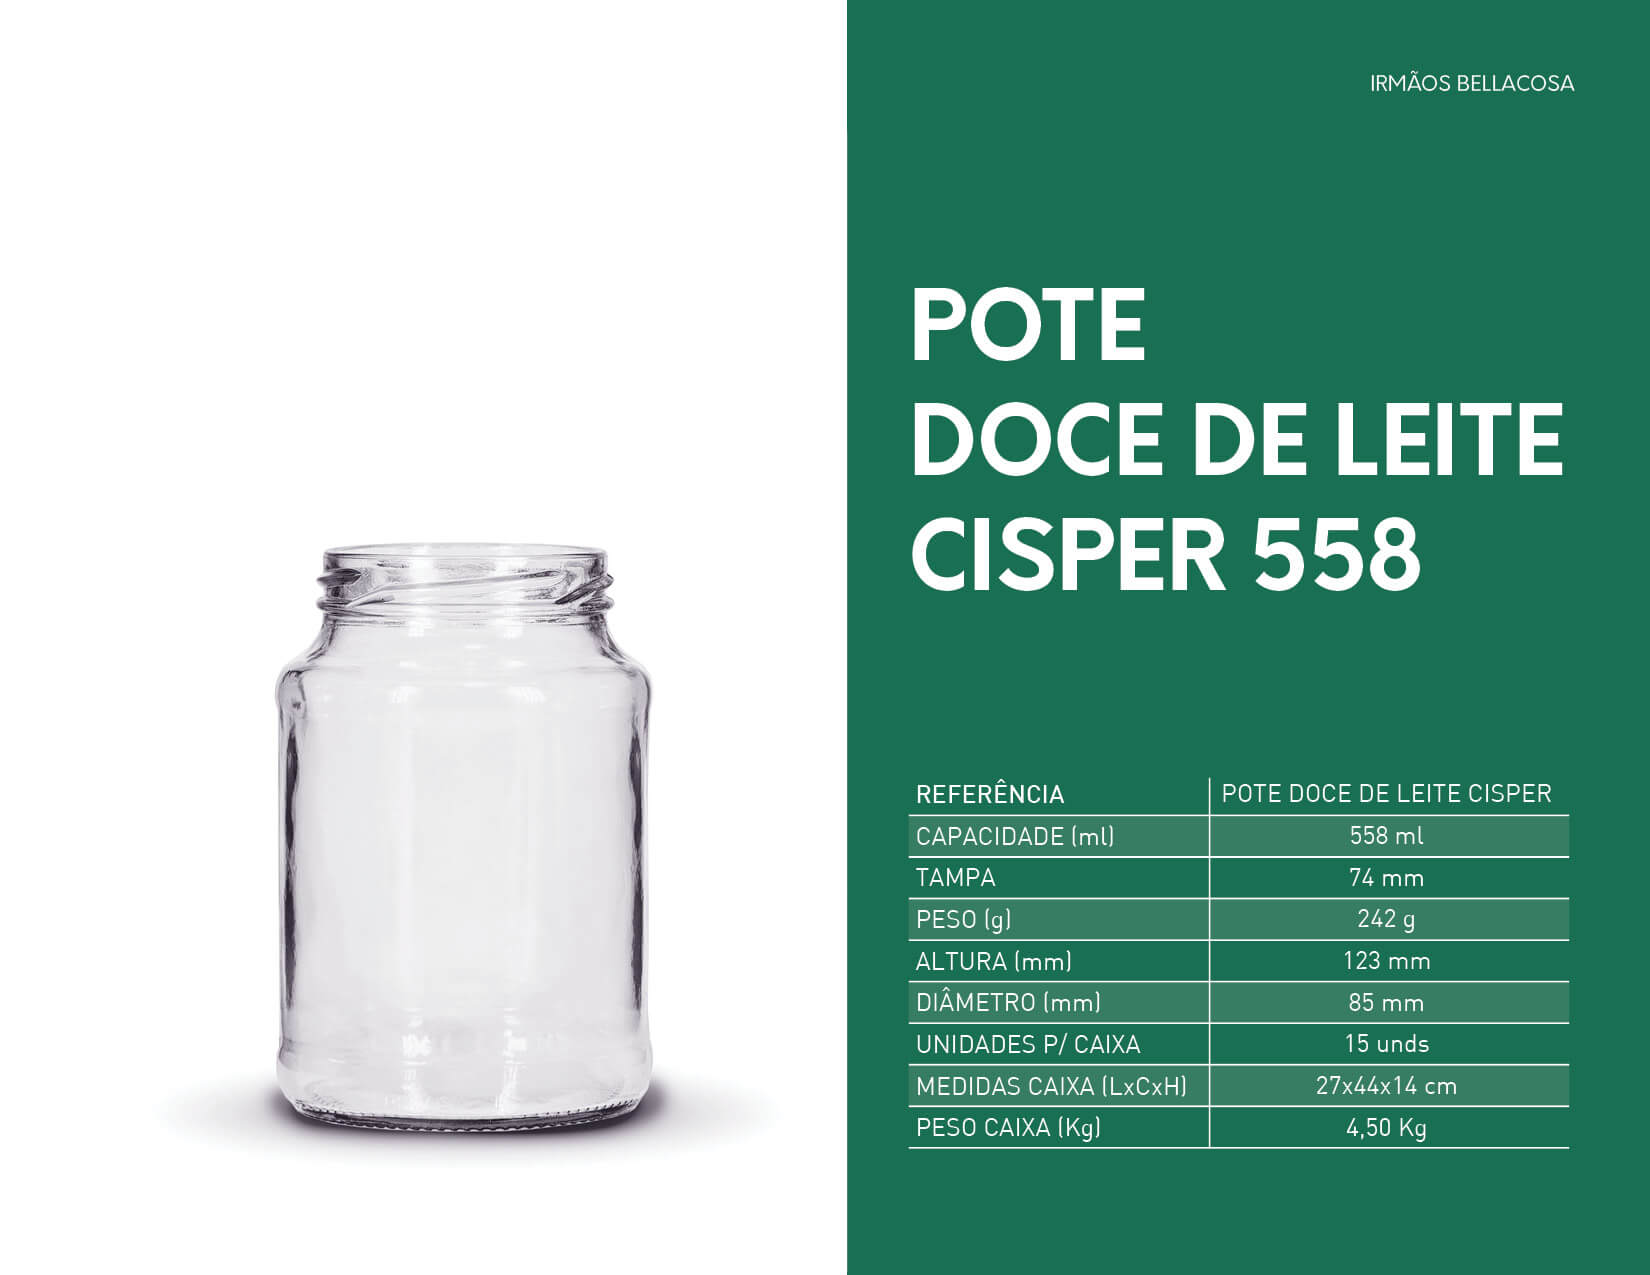 005-Pote-doce-de-leite-Cisper-558-irmaos-bellacosa-embalagens-de-vidro